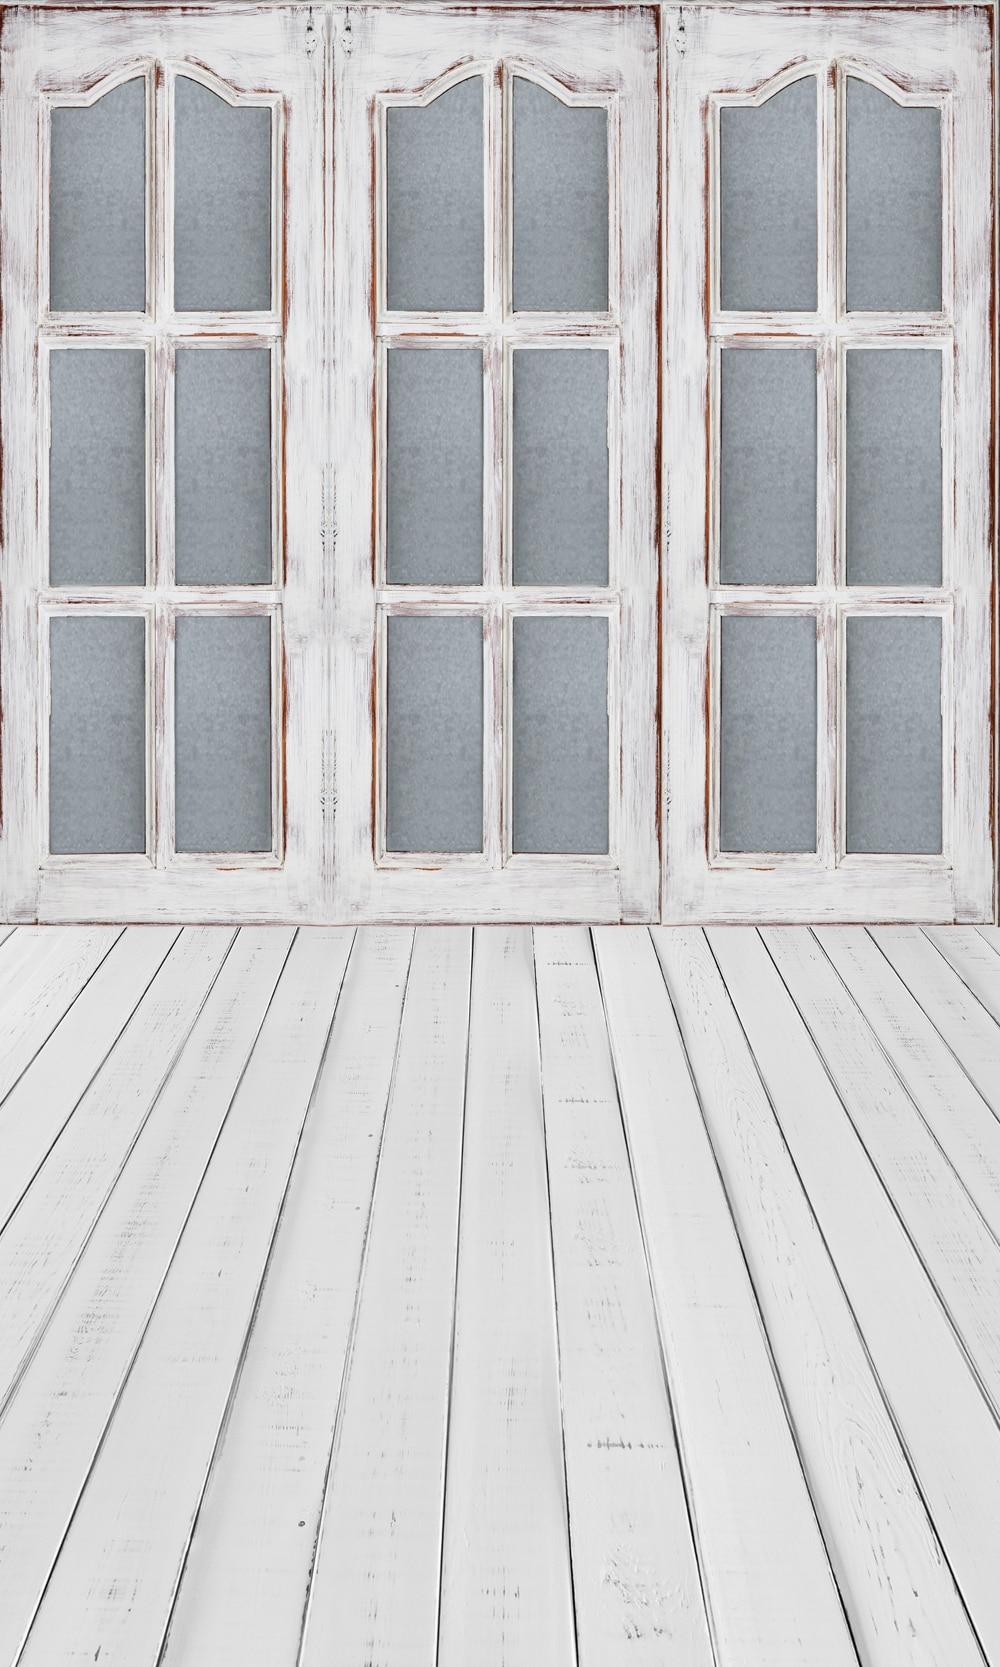 HUAYI 3x6m seamless wood floor Backdrop photography backdrops photo background vinyl backdrop wood door XT-6402